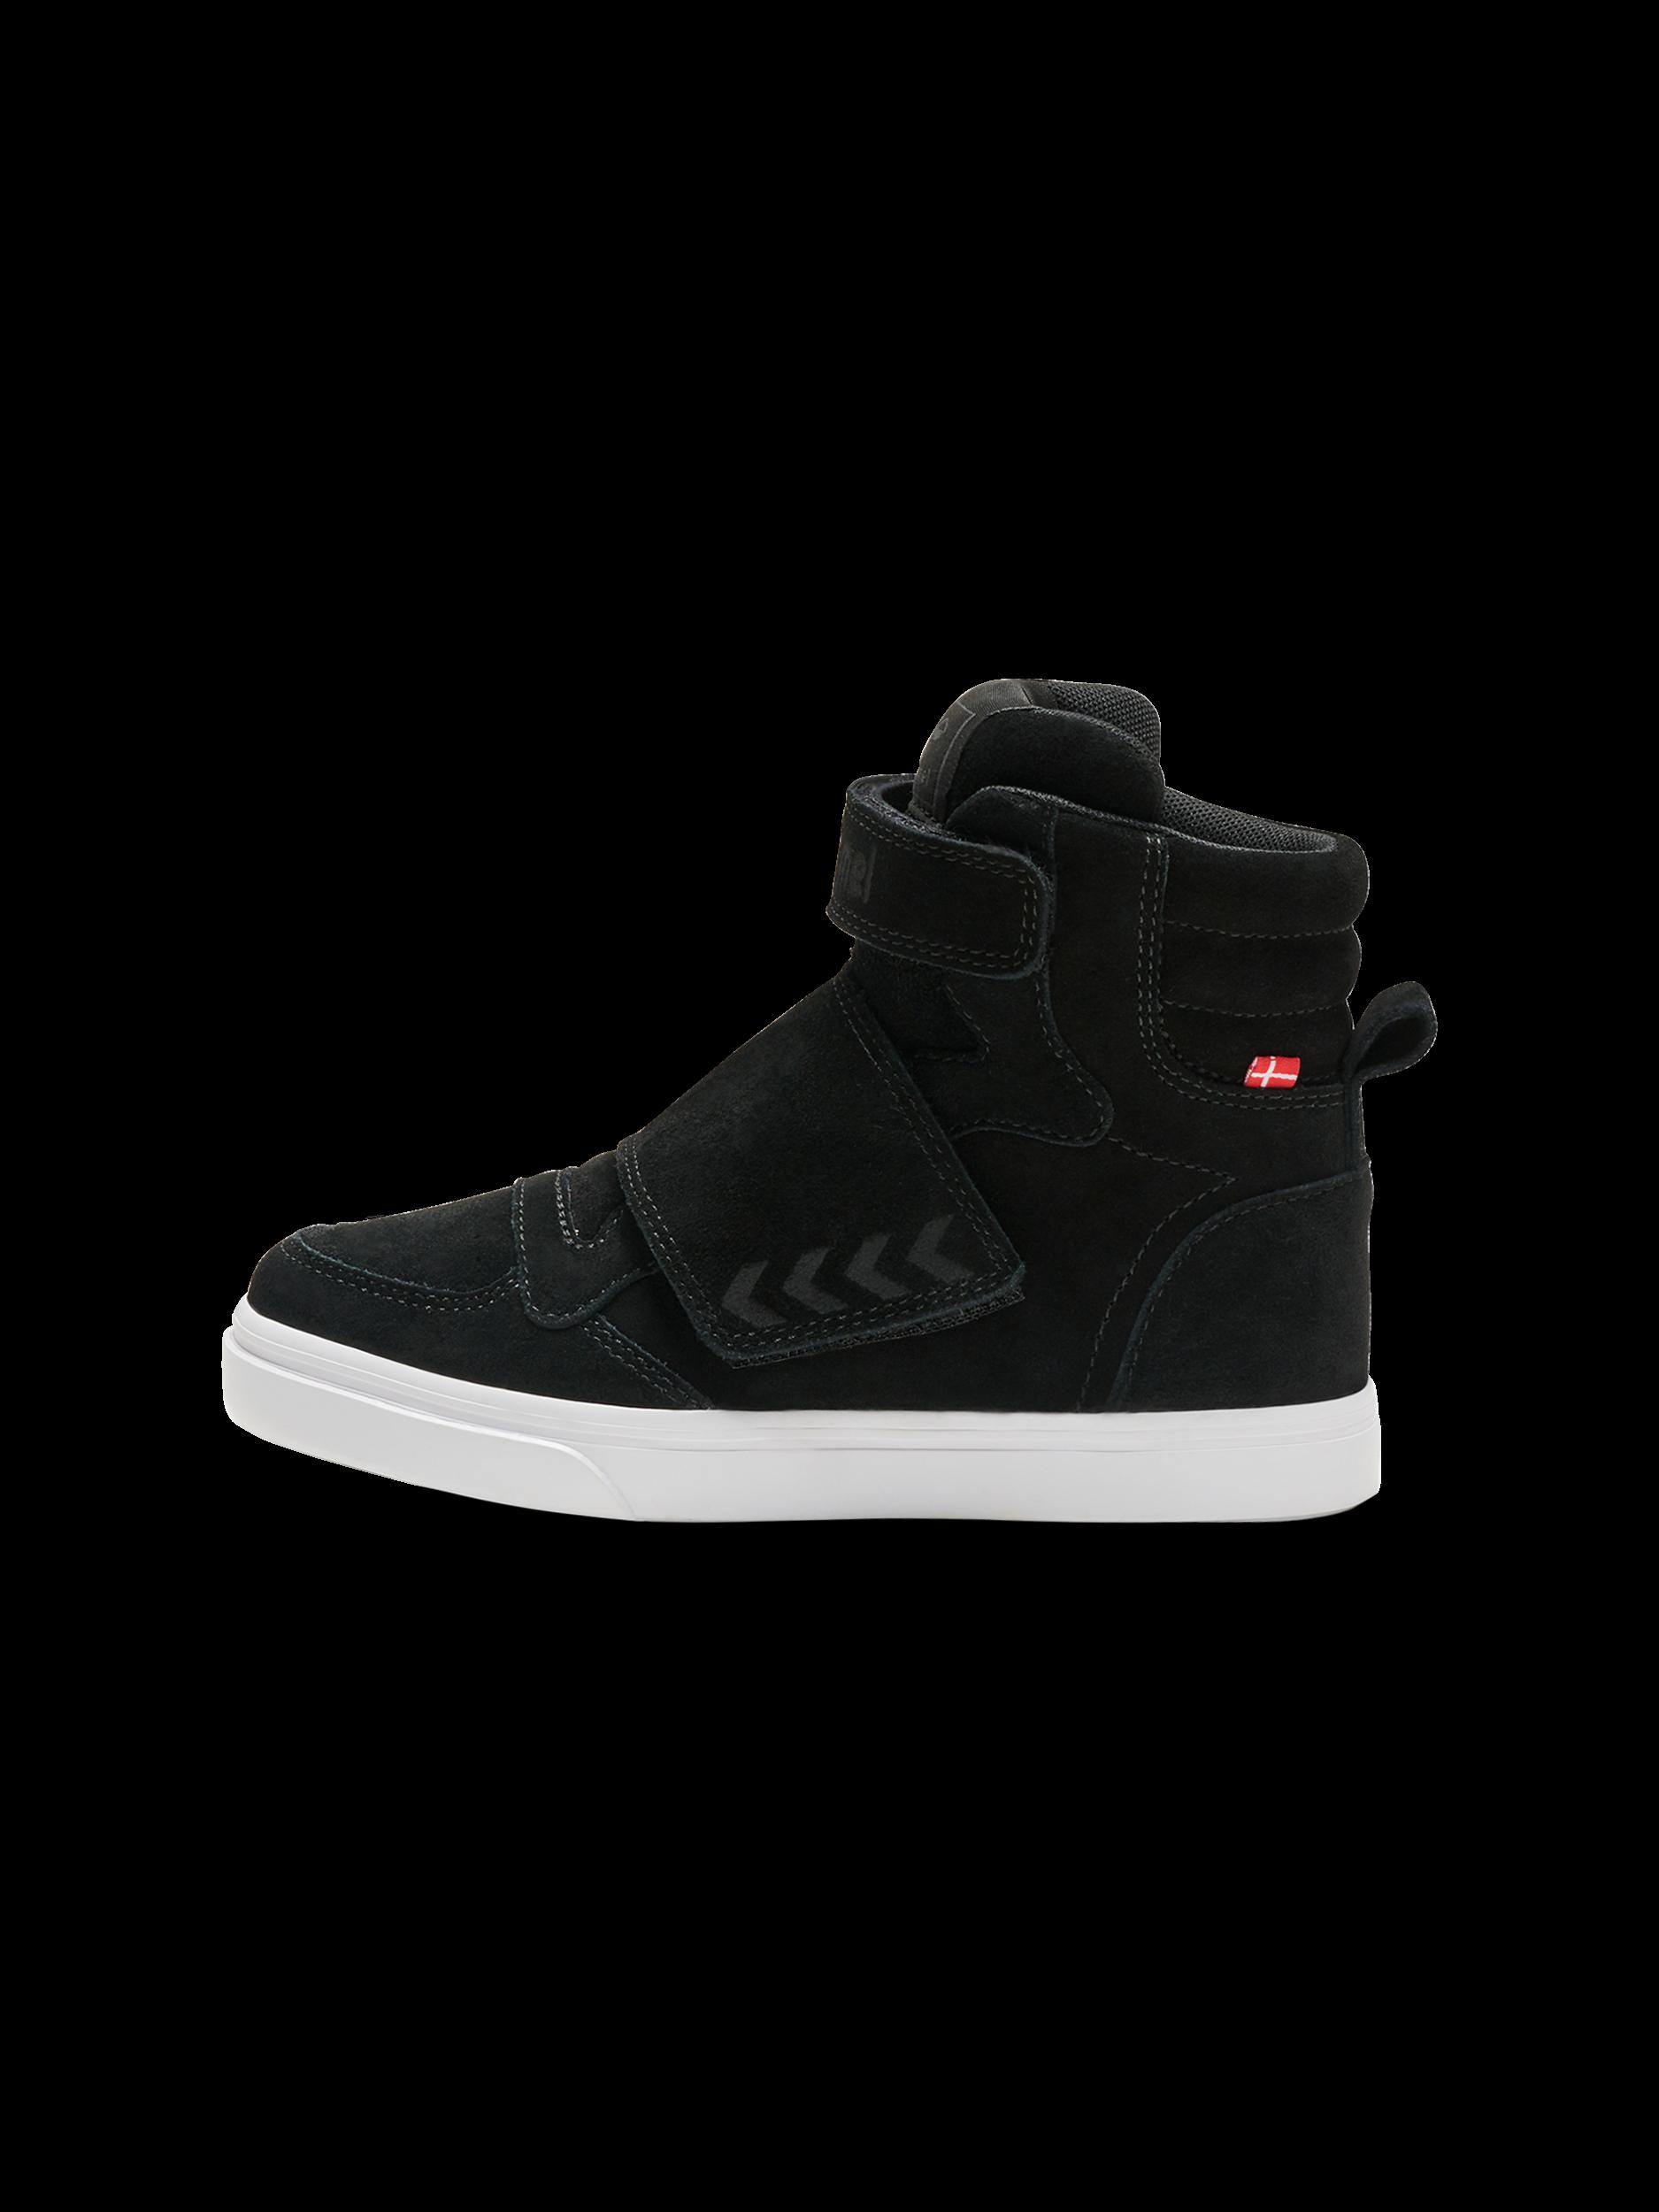 Hummel Stadil Tonal Jr. sneakers, black, 30